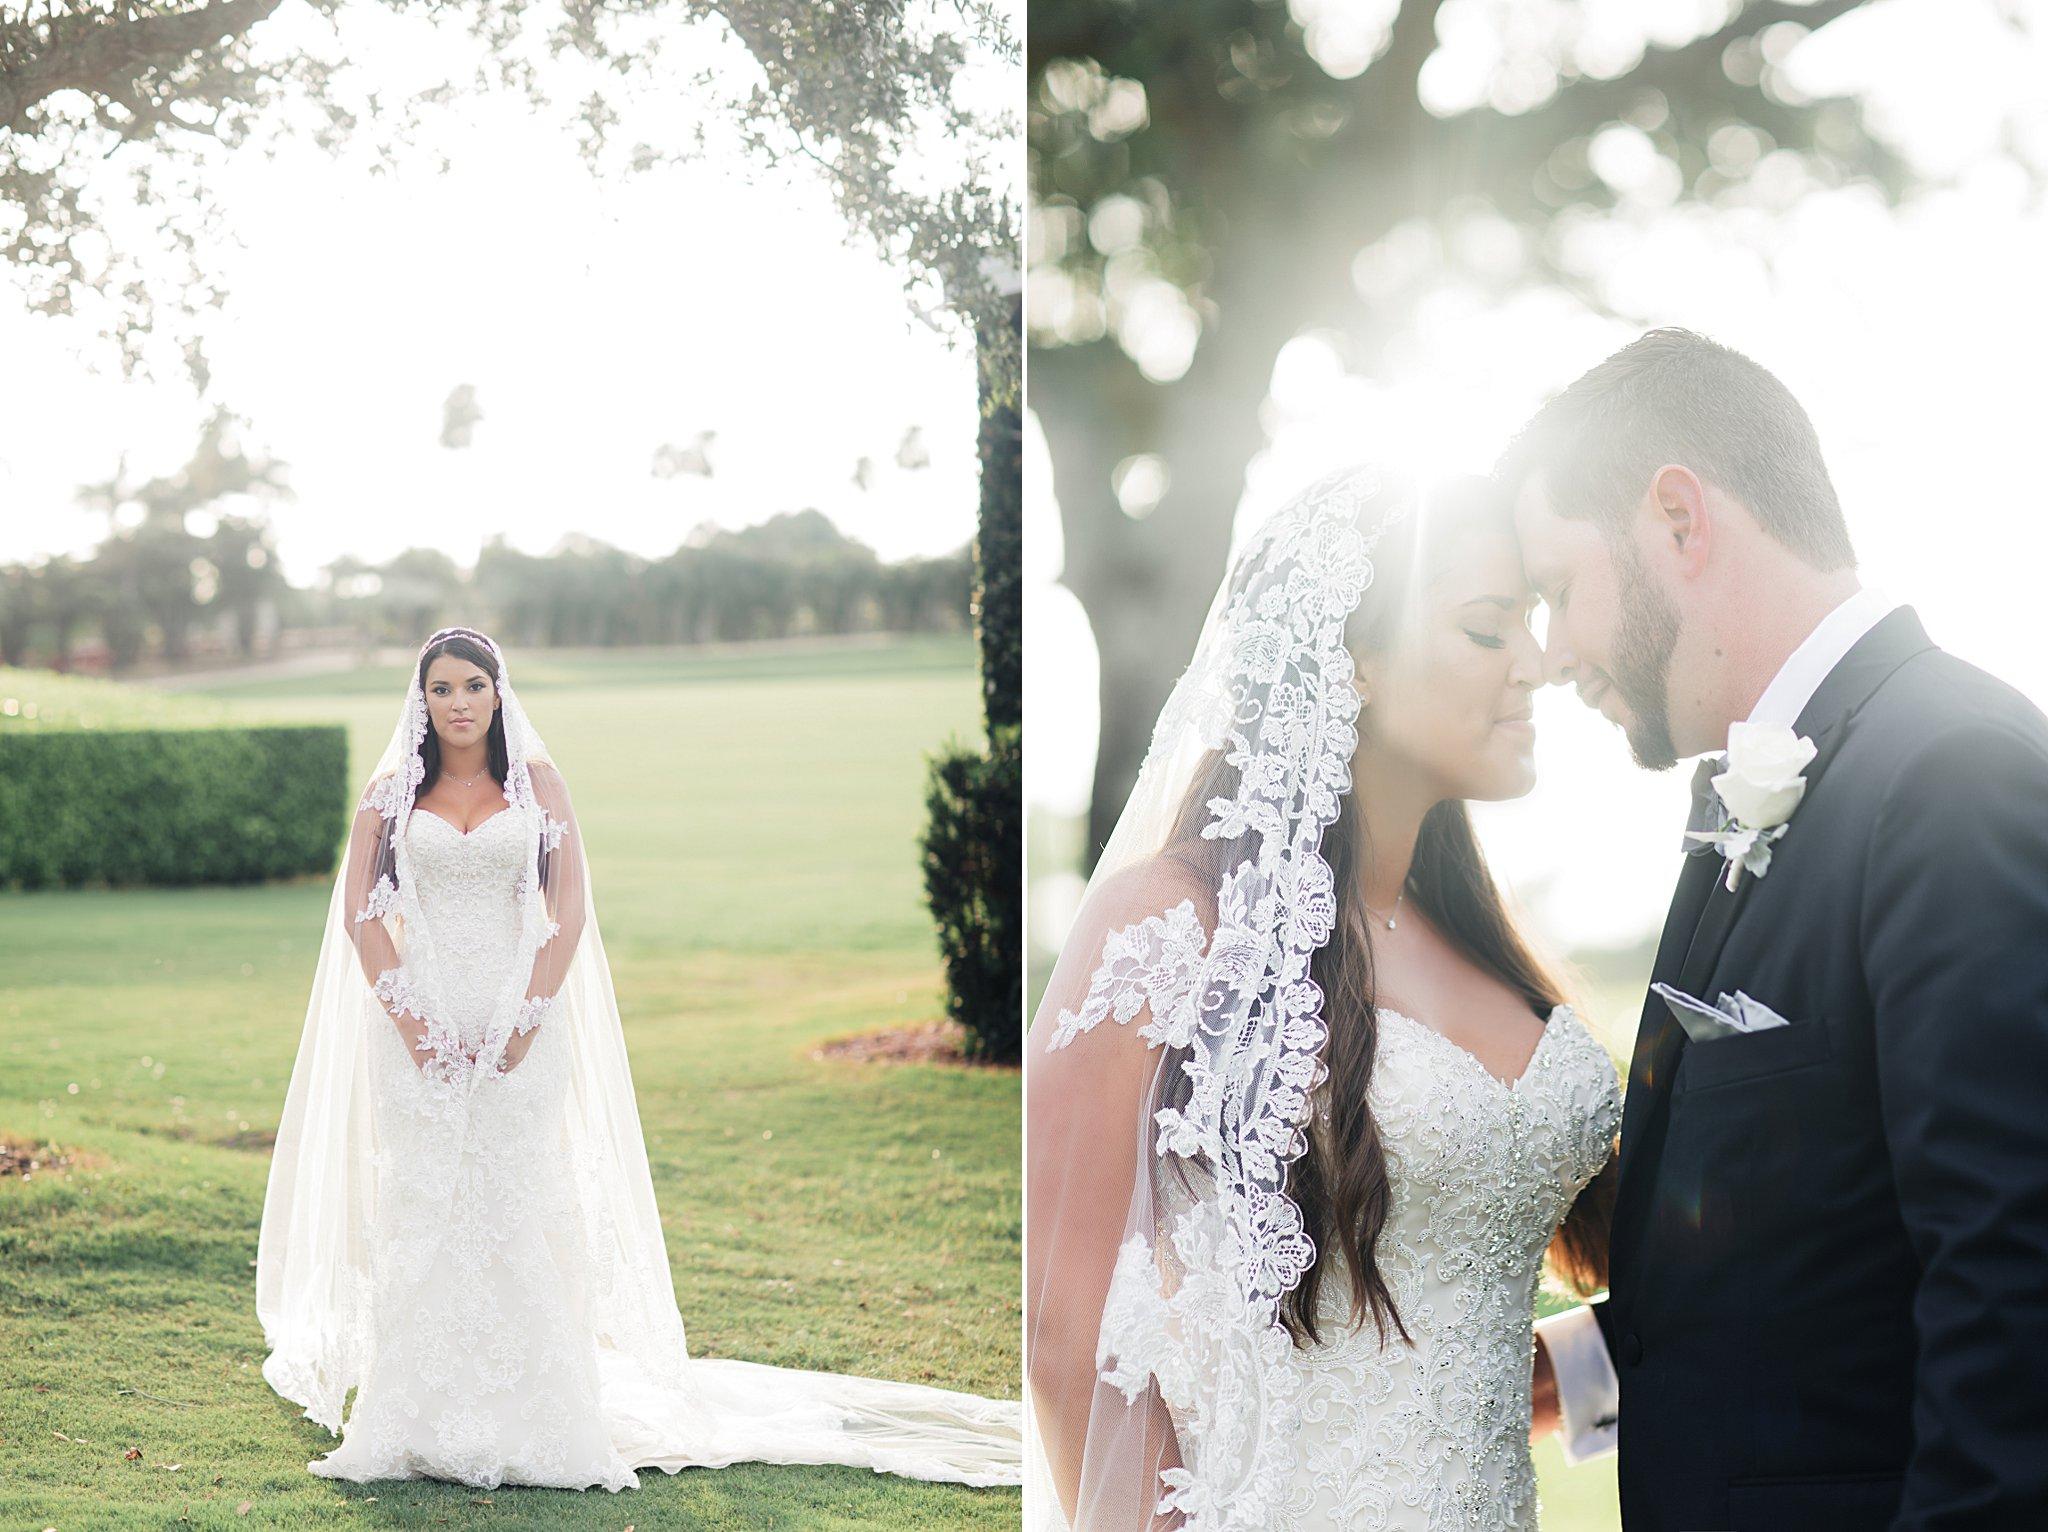 WeddingandEngagementFloridaPhotographer_2818.jpg